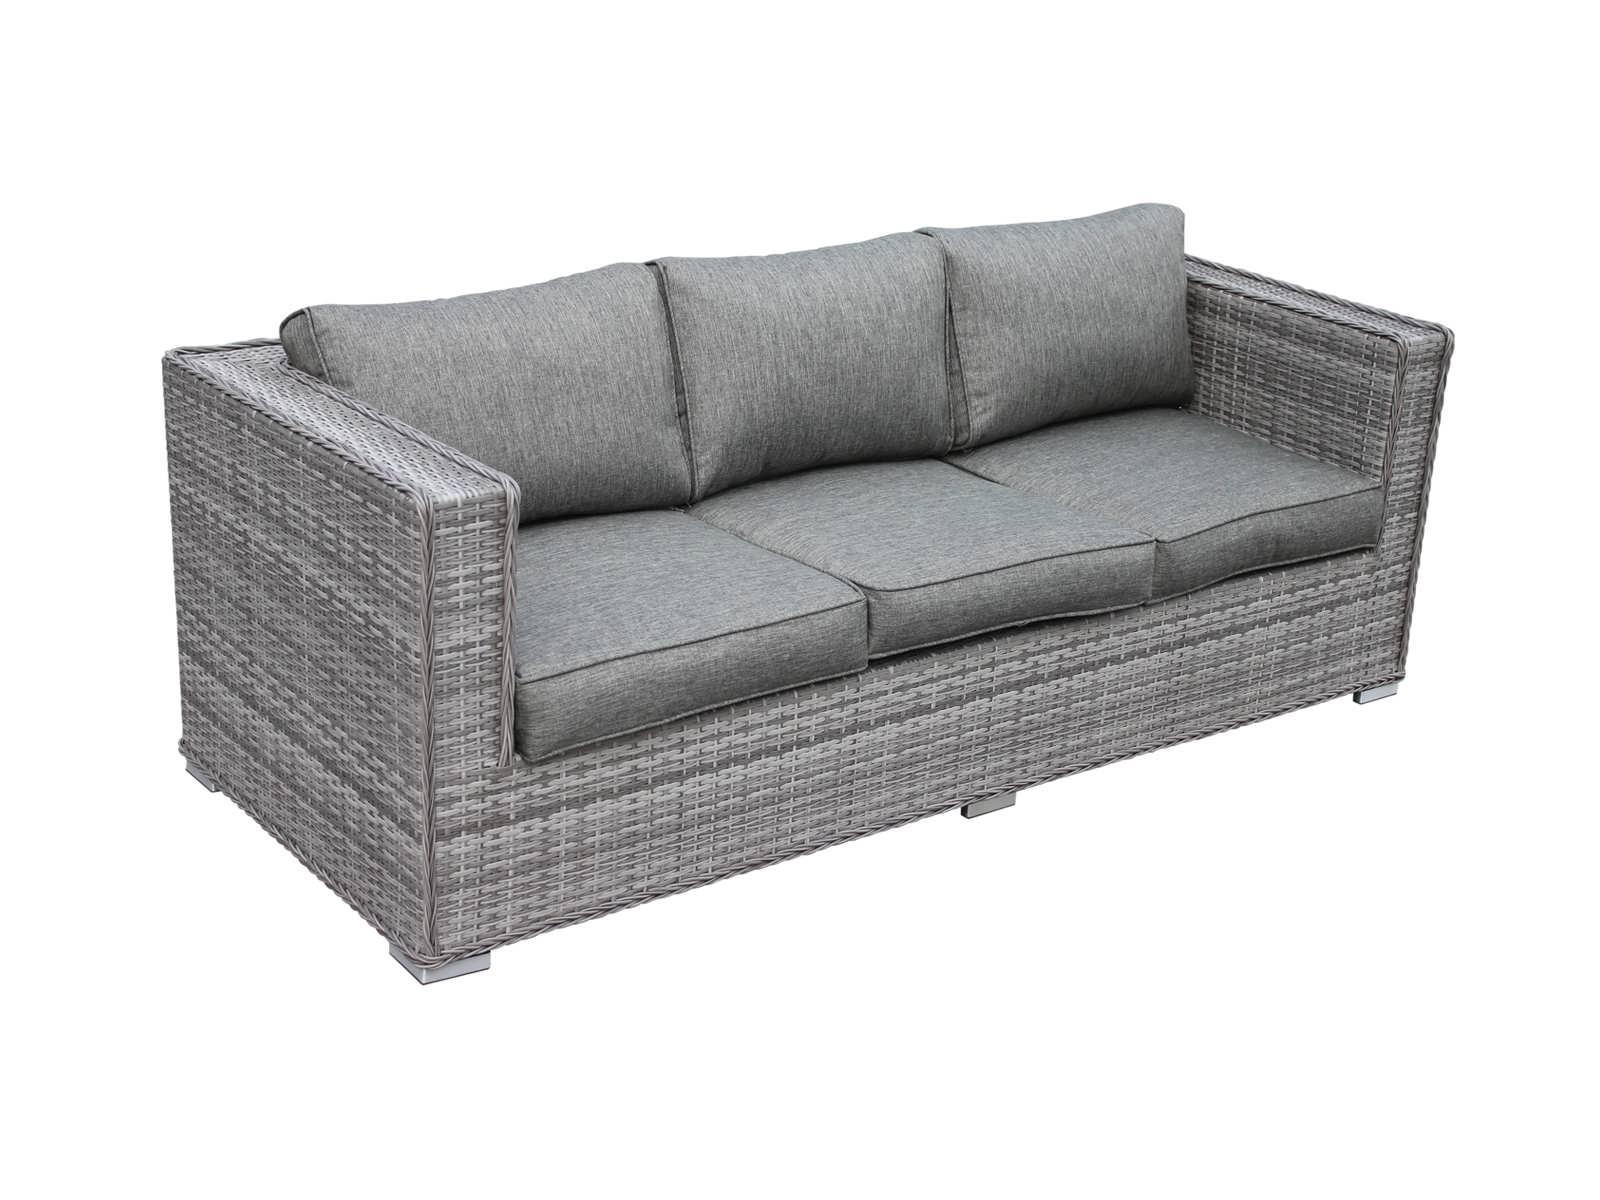 . Ascot 3 Seat Outdoor Rattan Sofa in Grey